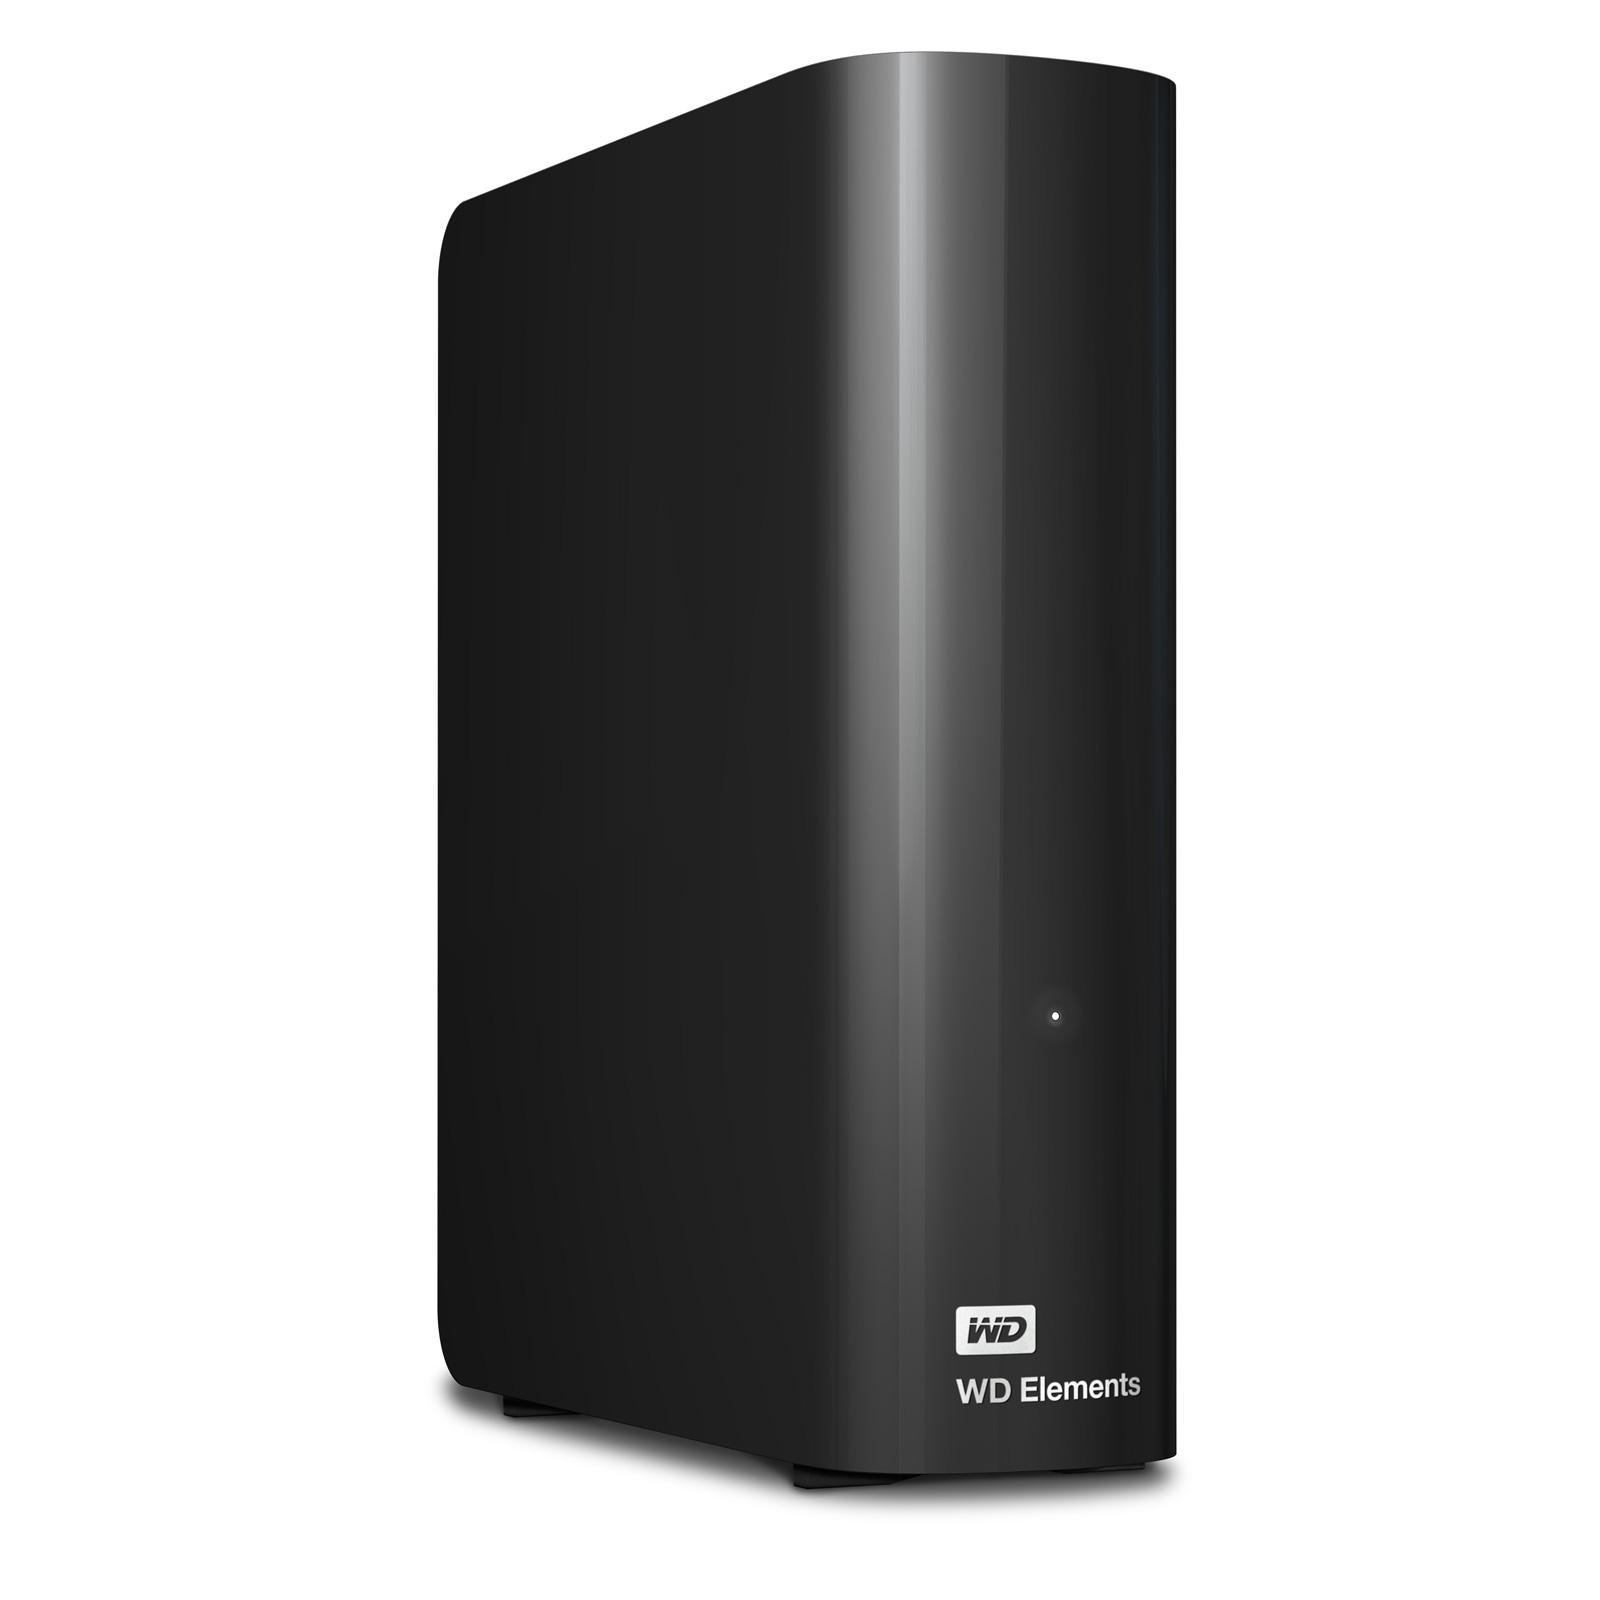 wd elements desktop 3 to usb 3 0 disque dur externe western digital sur ldlc. Black Bedroom Furniture Sets. Home Design Ideas